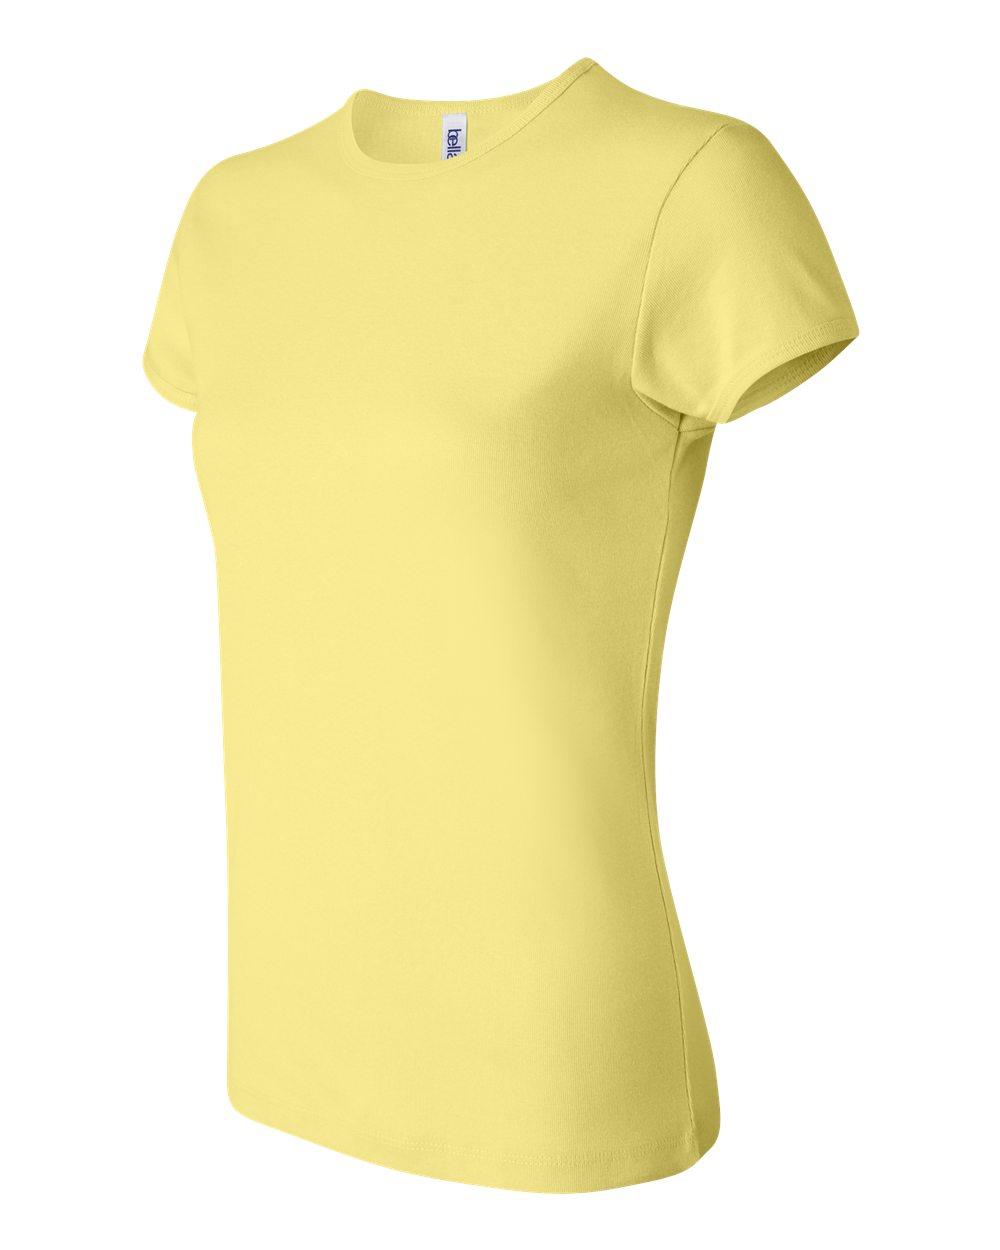 Bella 1001 Yellow